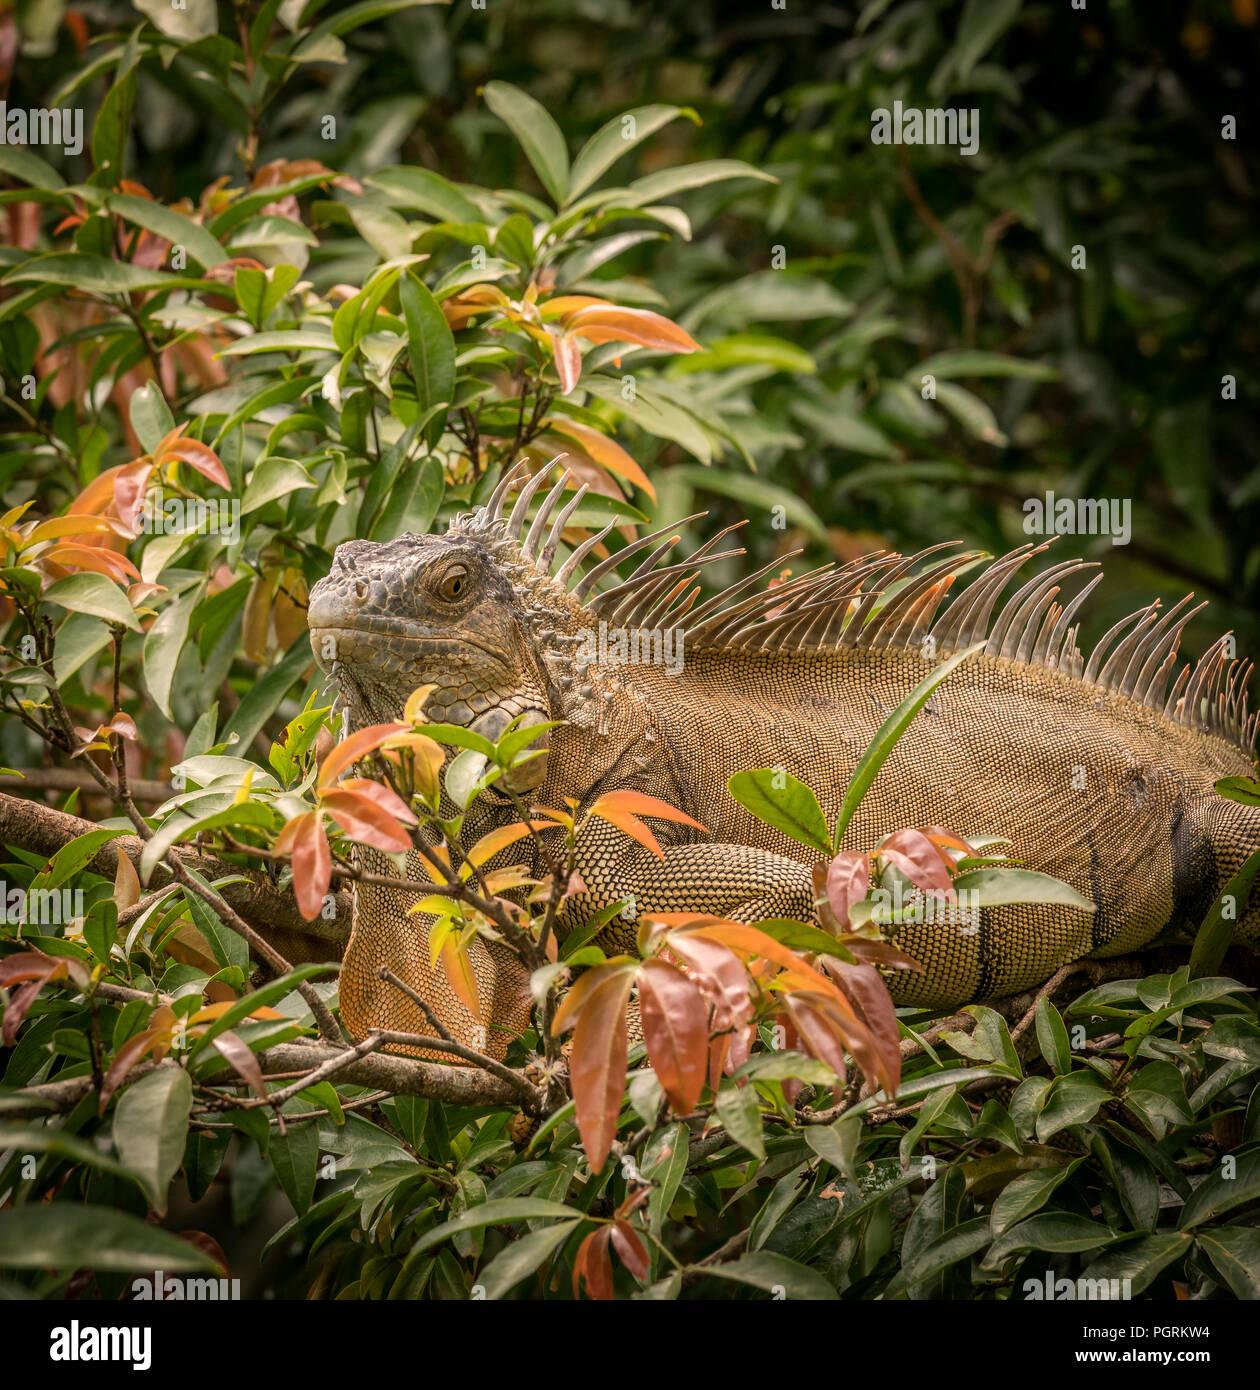 Black Iguana, Costa Rica - Stock Image